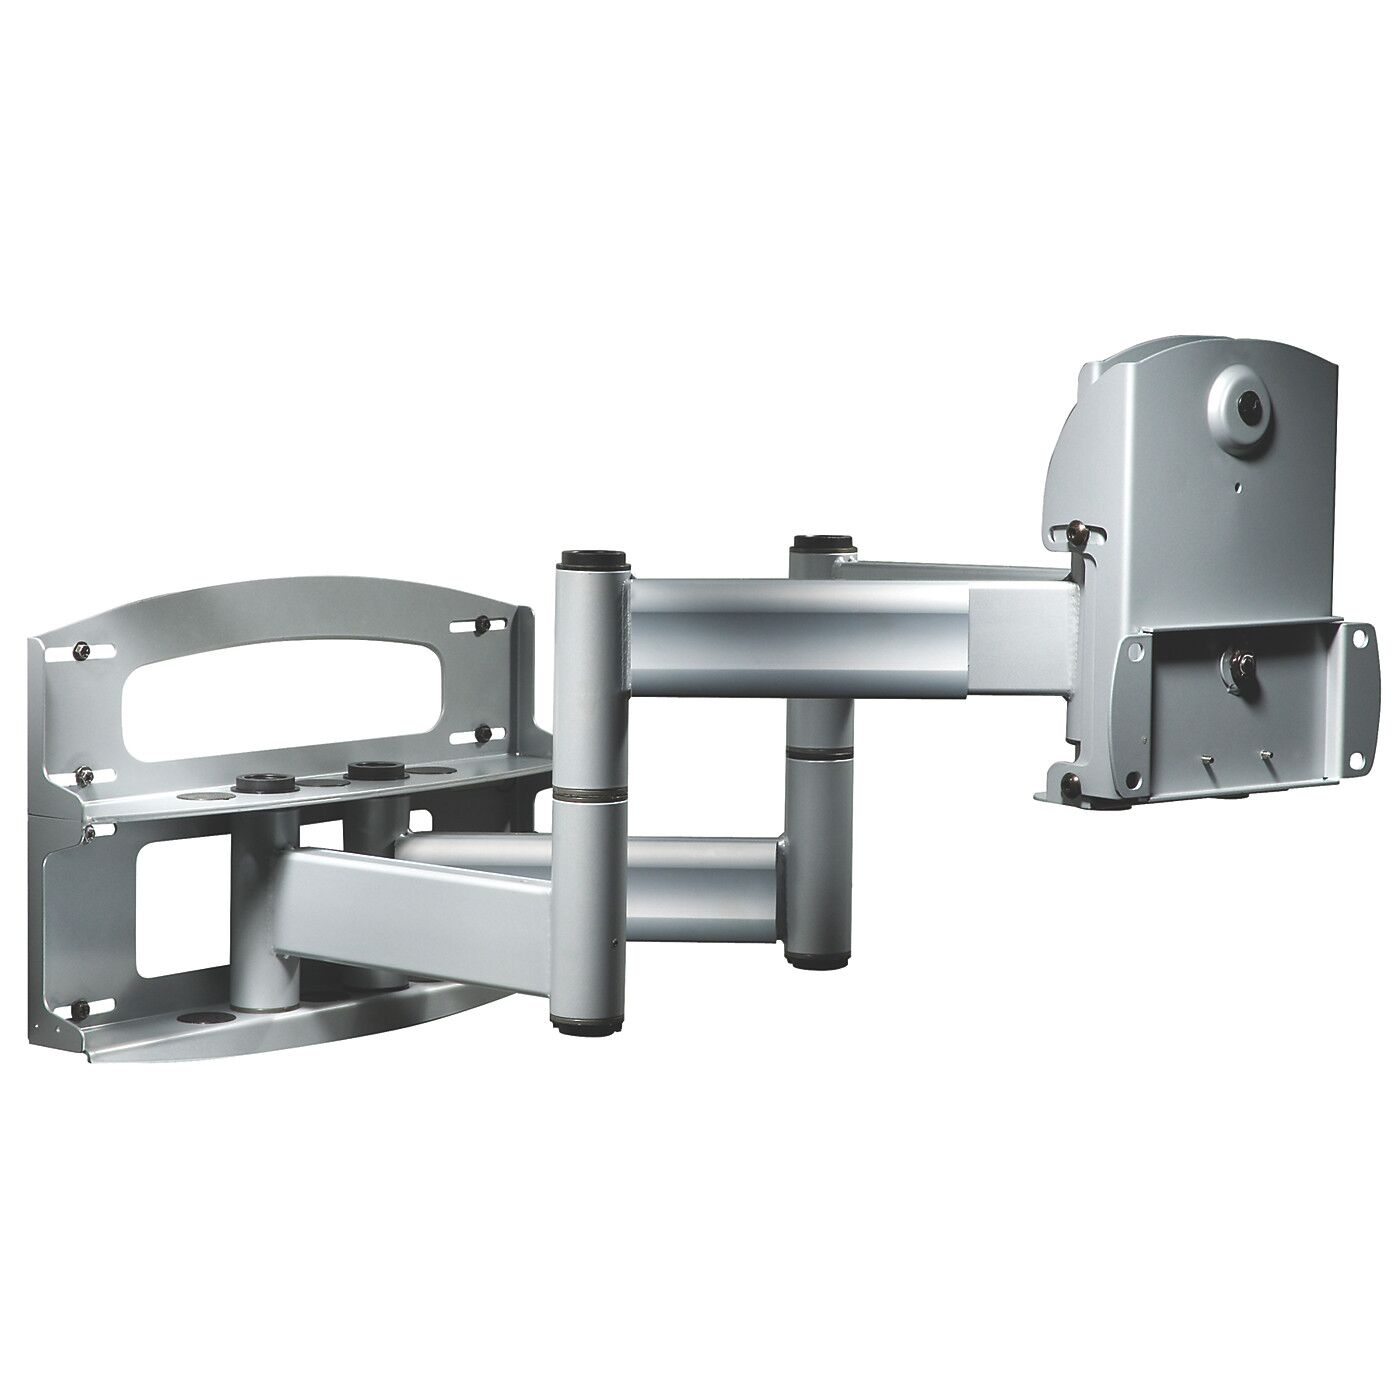 Flat Panel Dual Articulating Arm/Tilt Wall Mount for 42